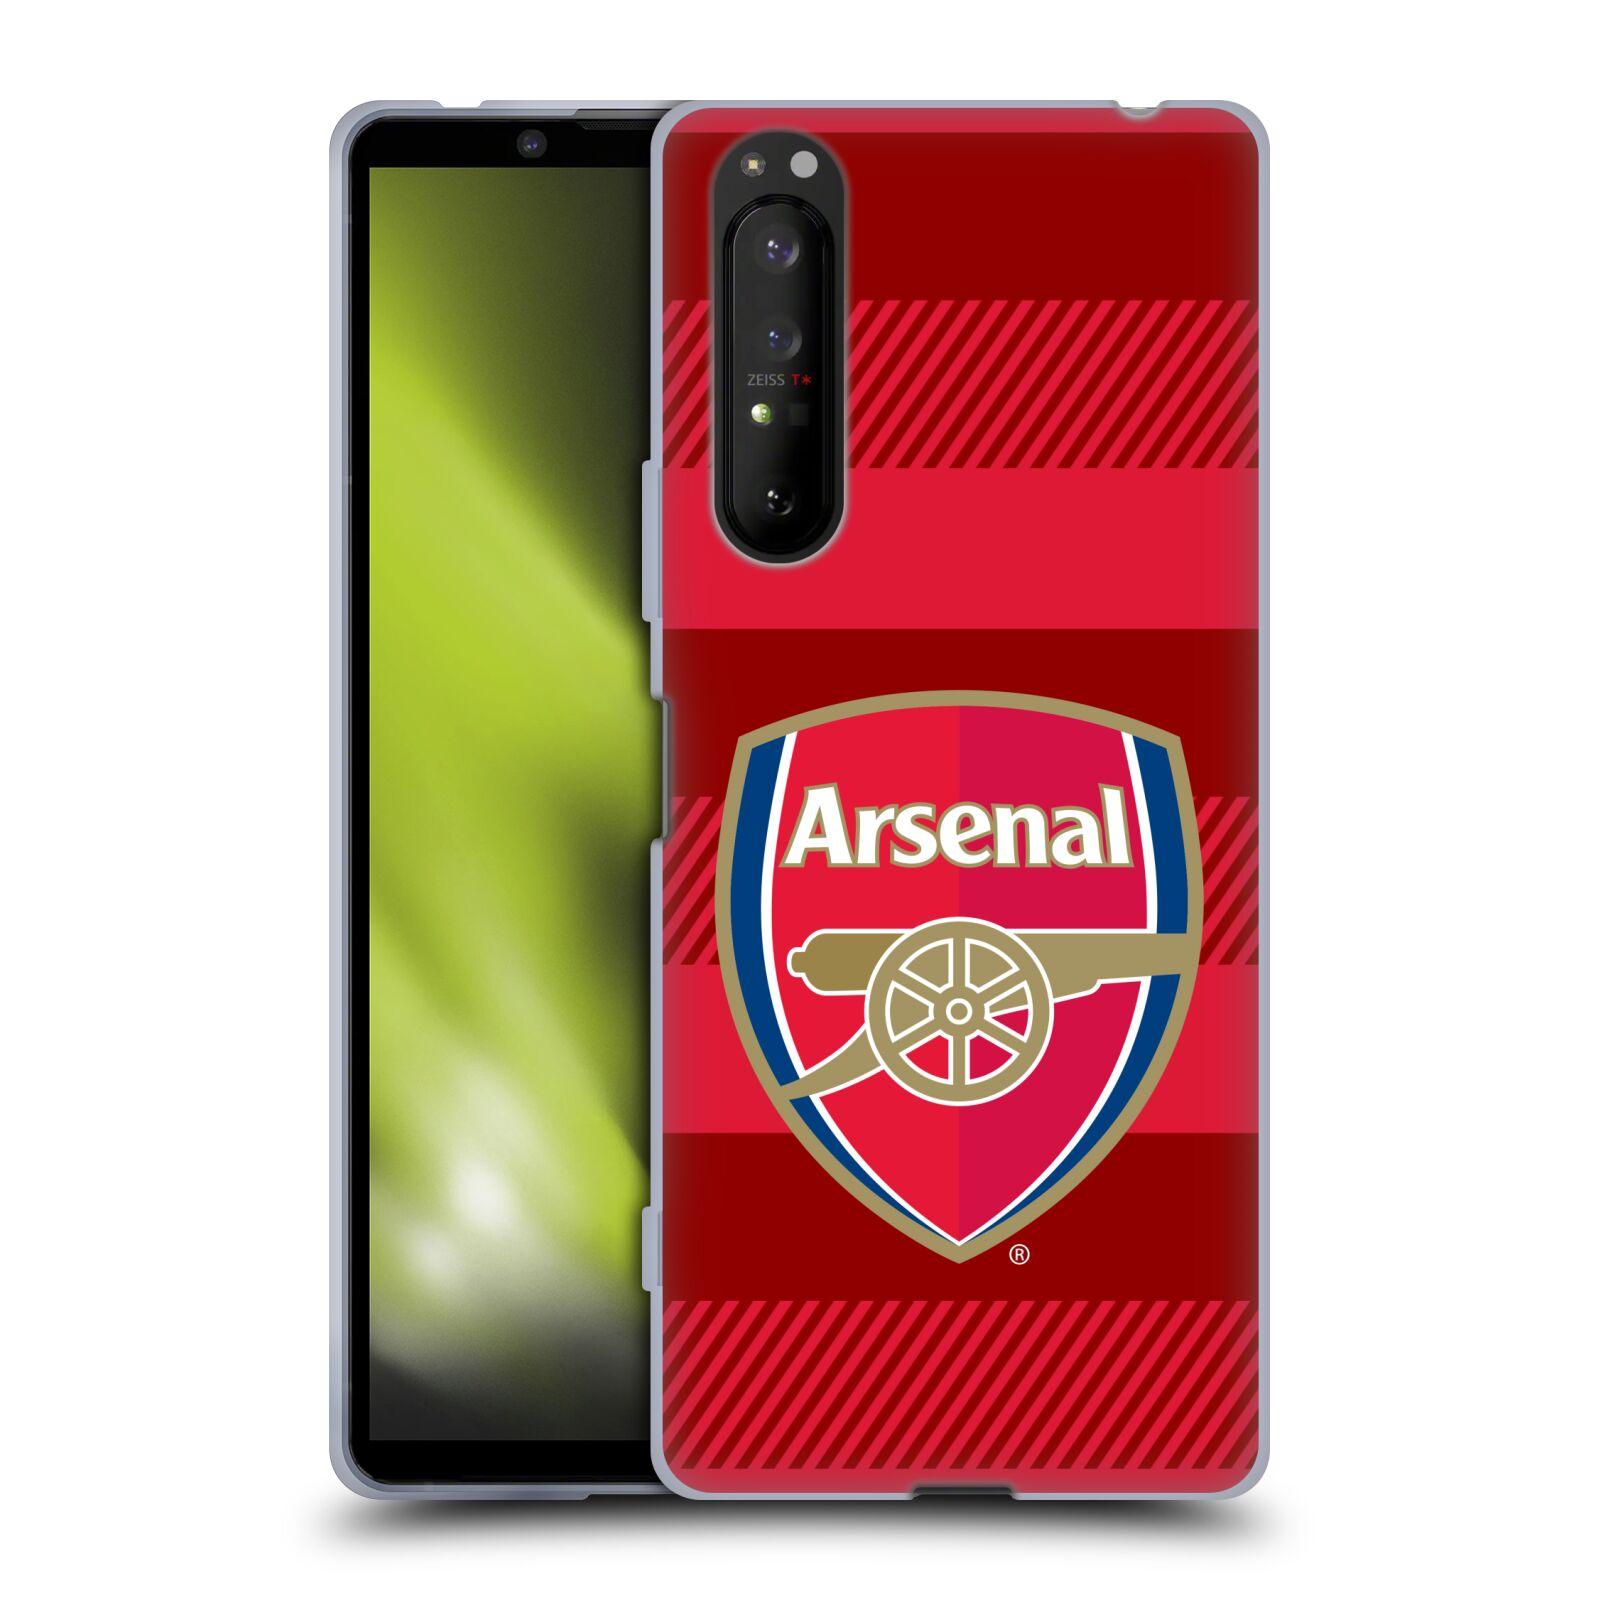 Silikonové pouzdro na mobil Sony Xperia 1 II - Head Case - Arsenal FC - Logo s pruhy